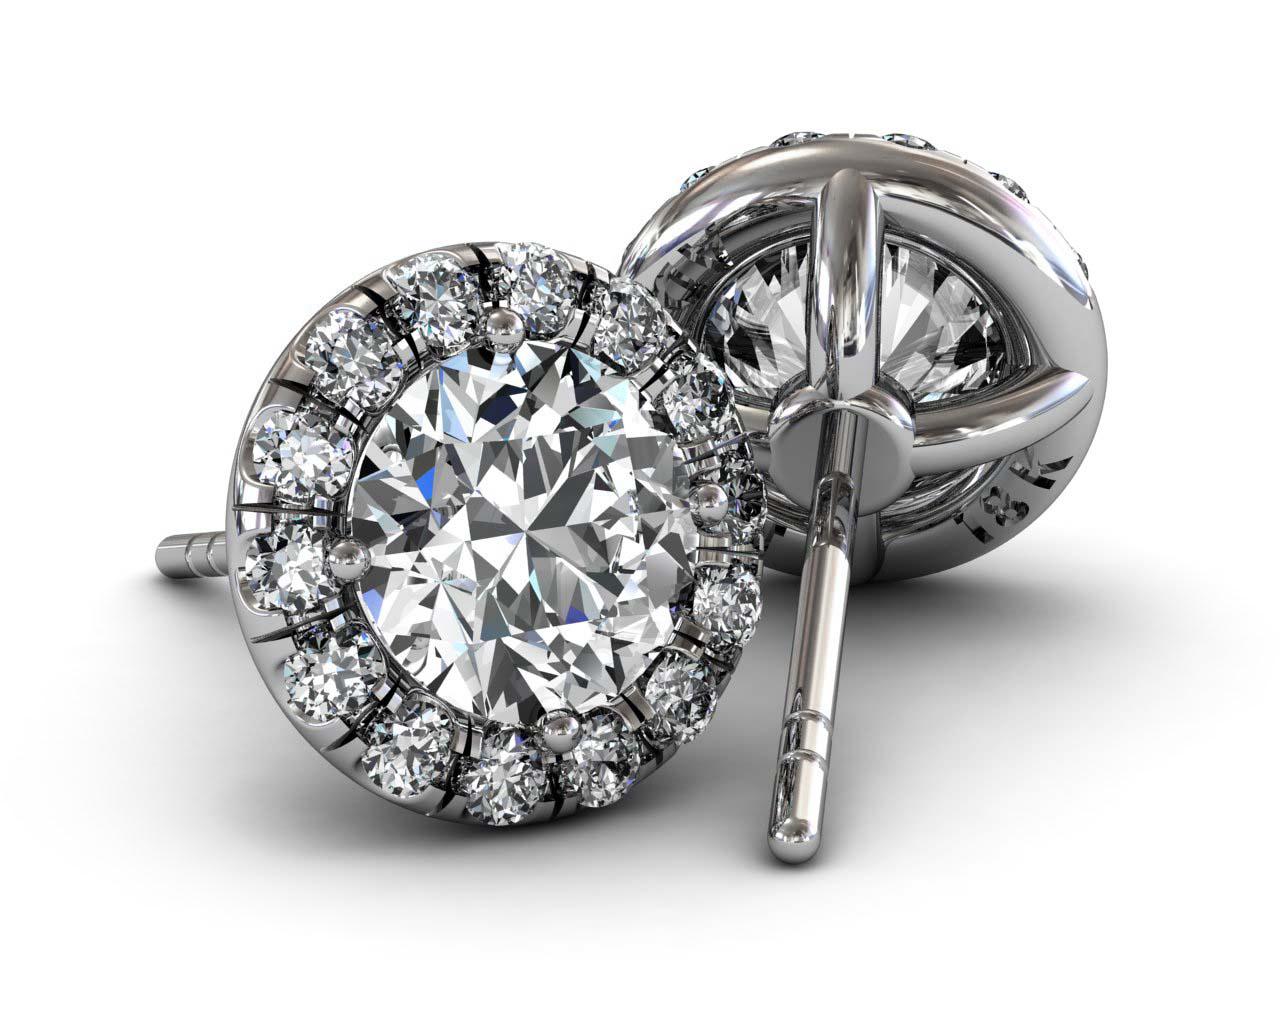 Diamond Halo Stud Earring U Cut Fashion Designer jewelry Store - on Sale Christmas